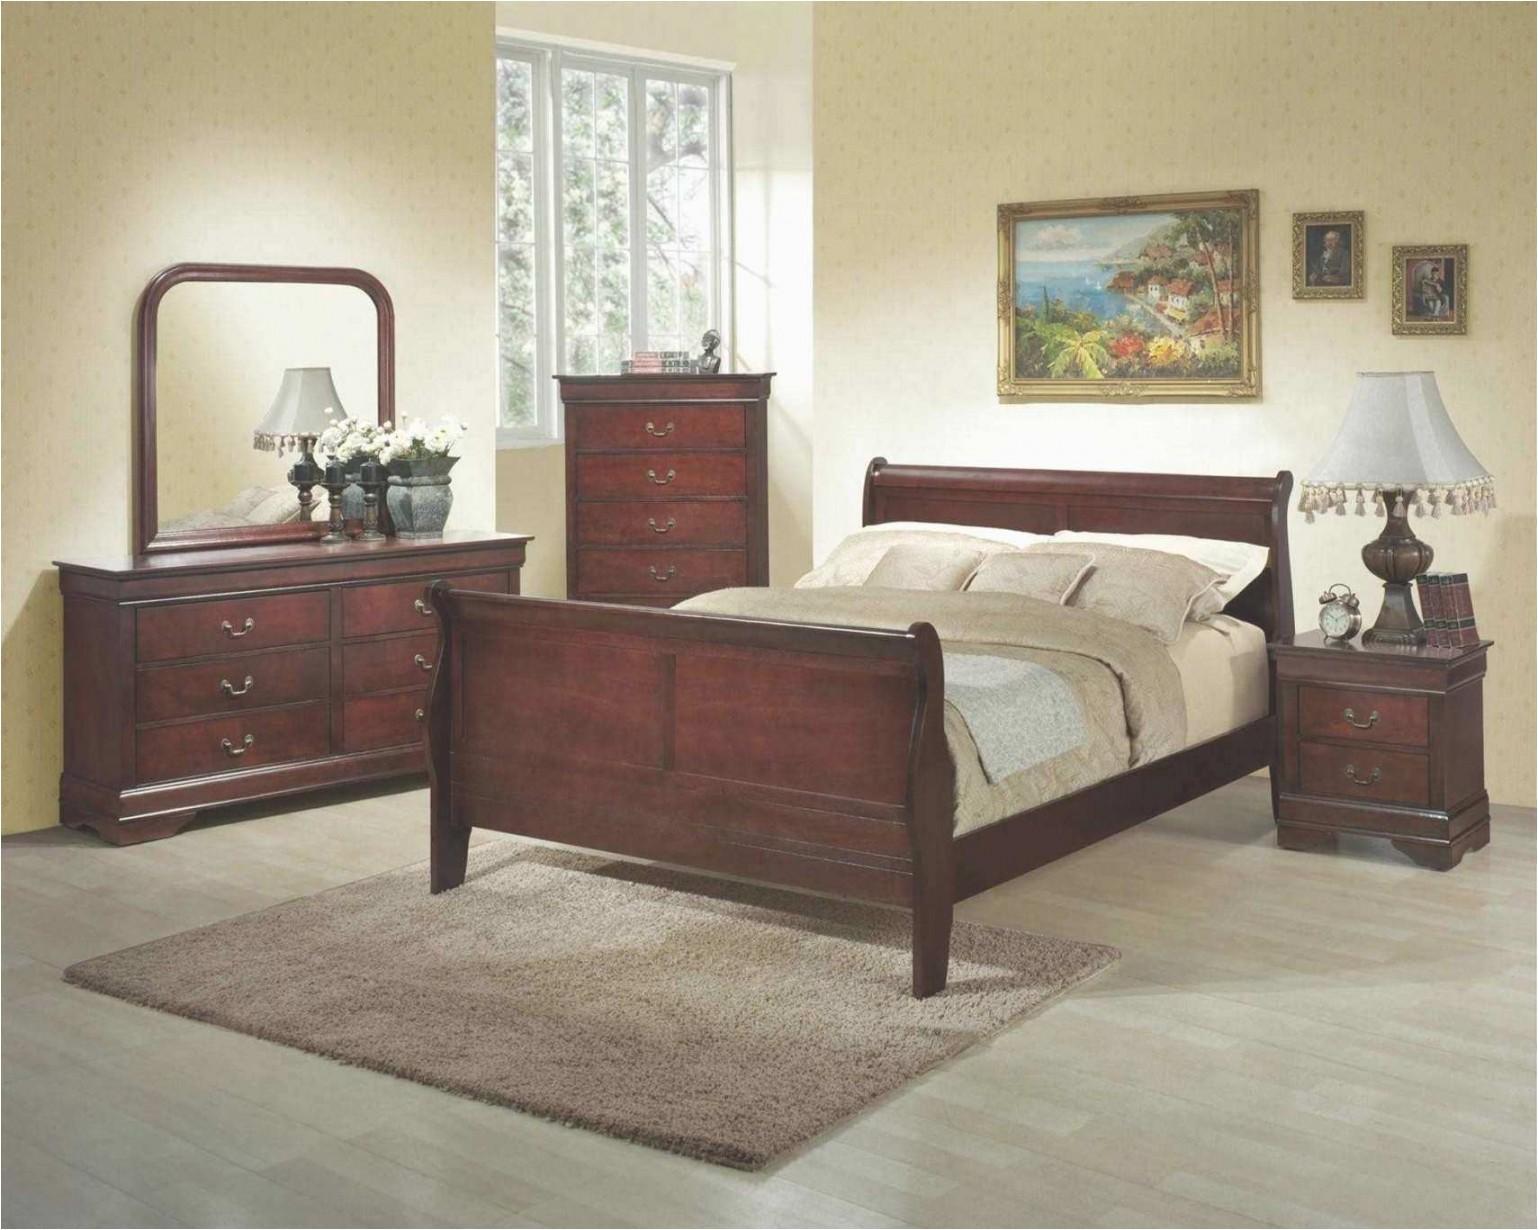 thomasville bedroom furniture sets wondrous vintage thomasville furniture catalog best of 30 luxury queen anne